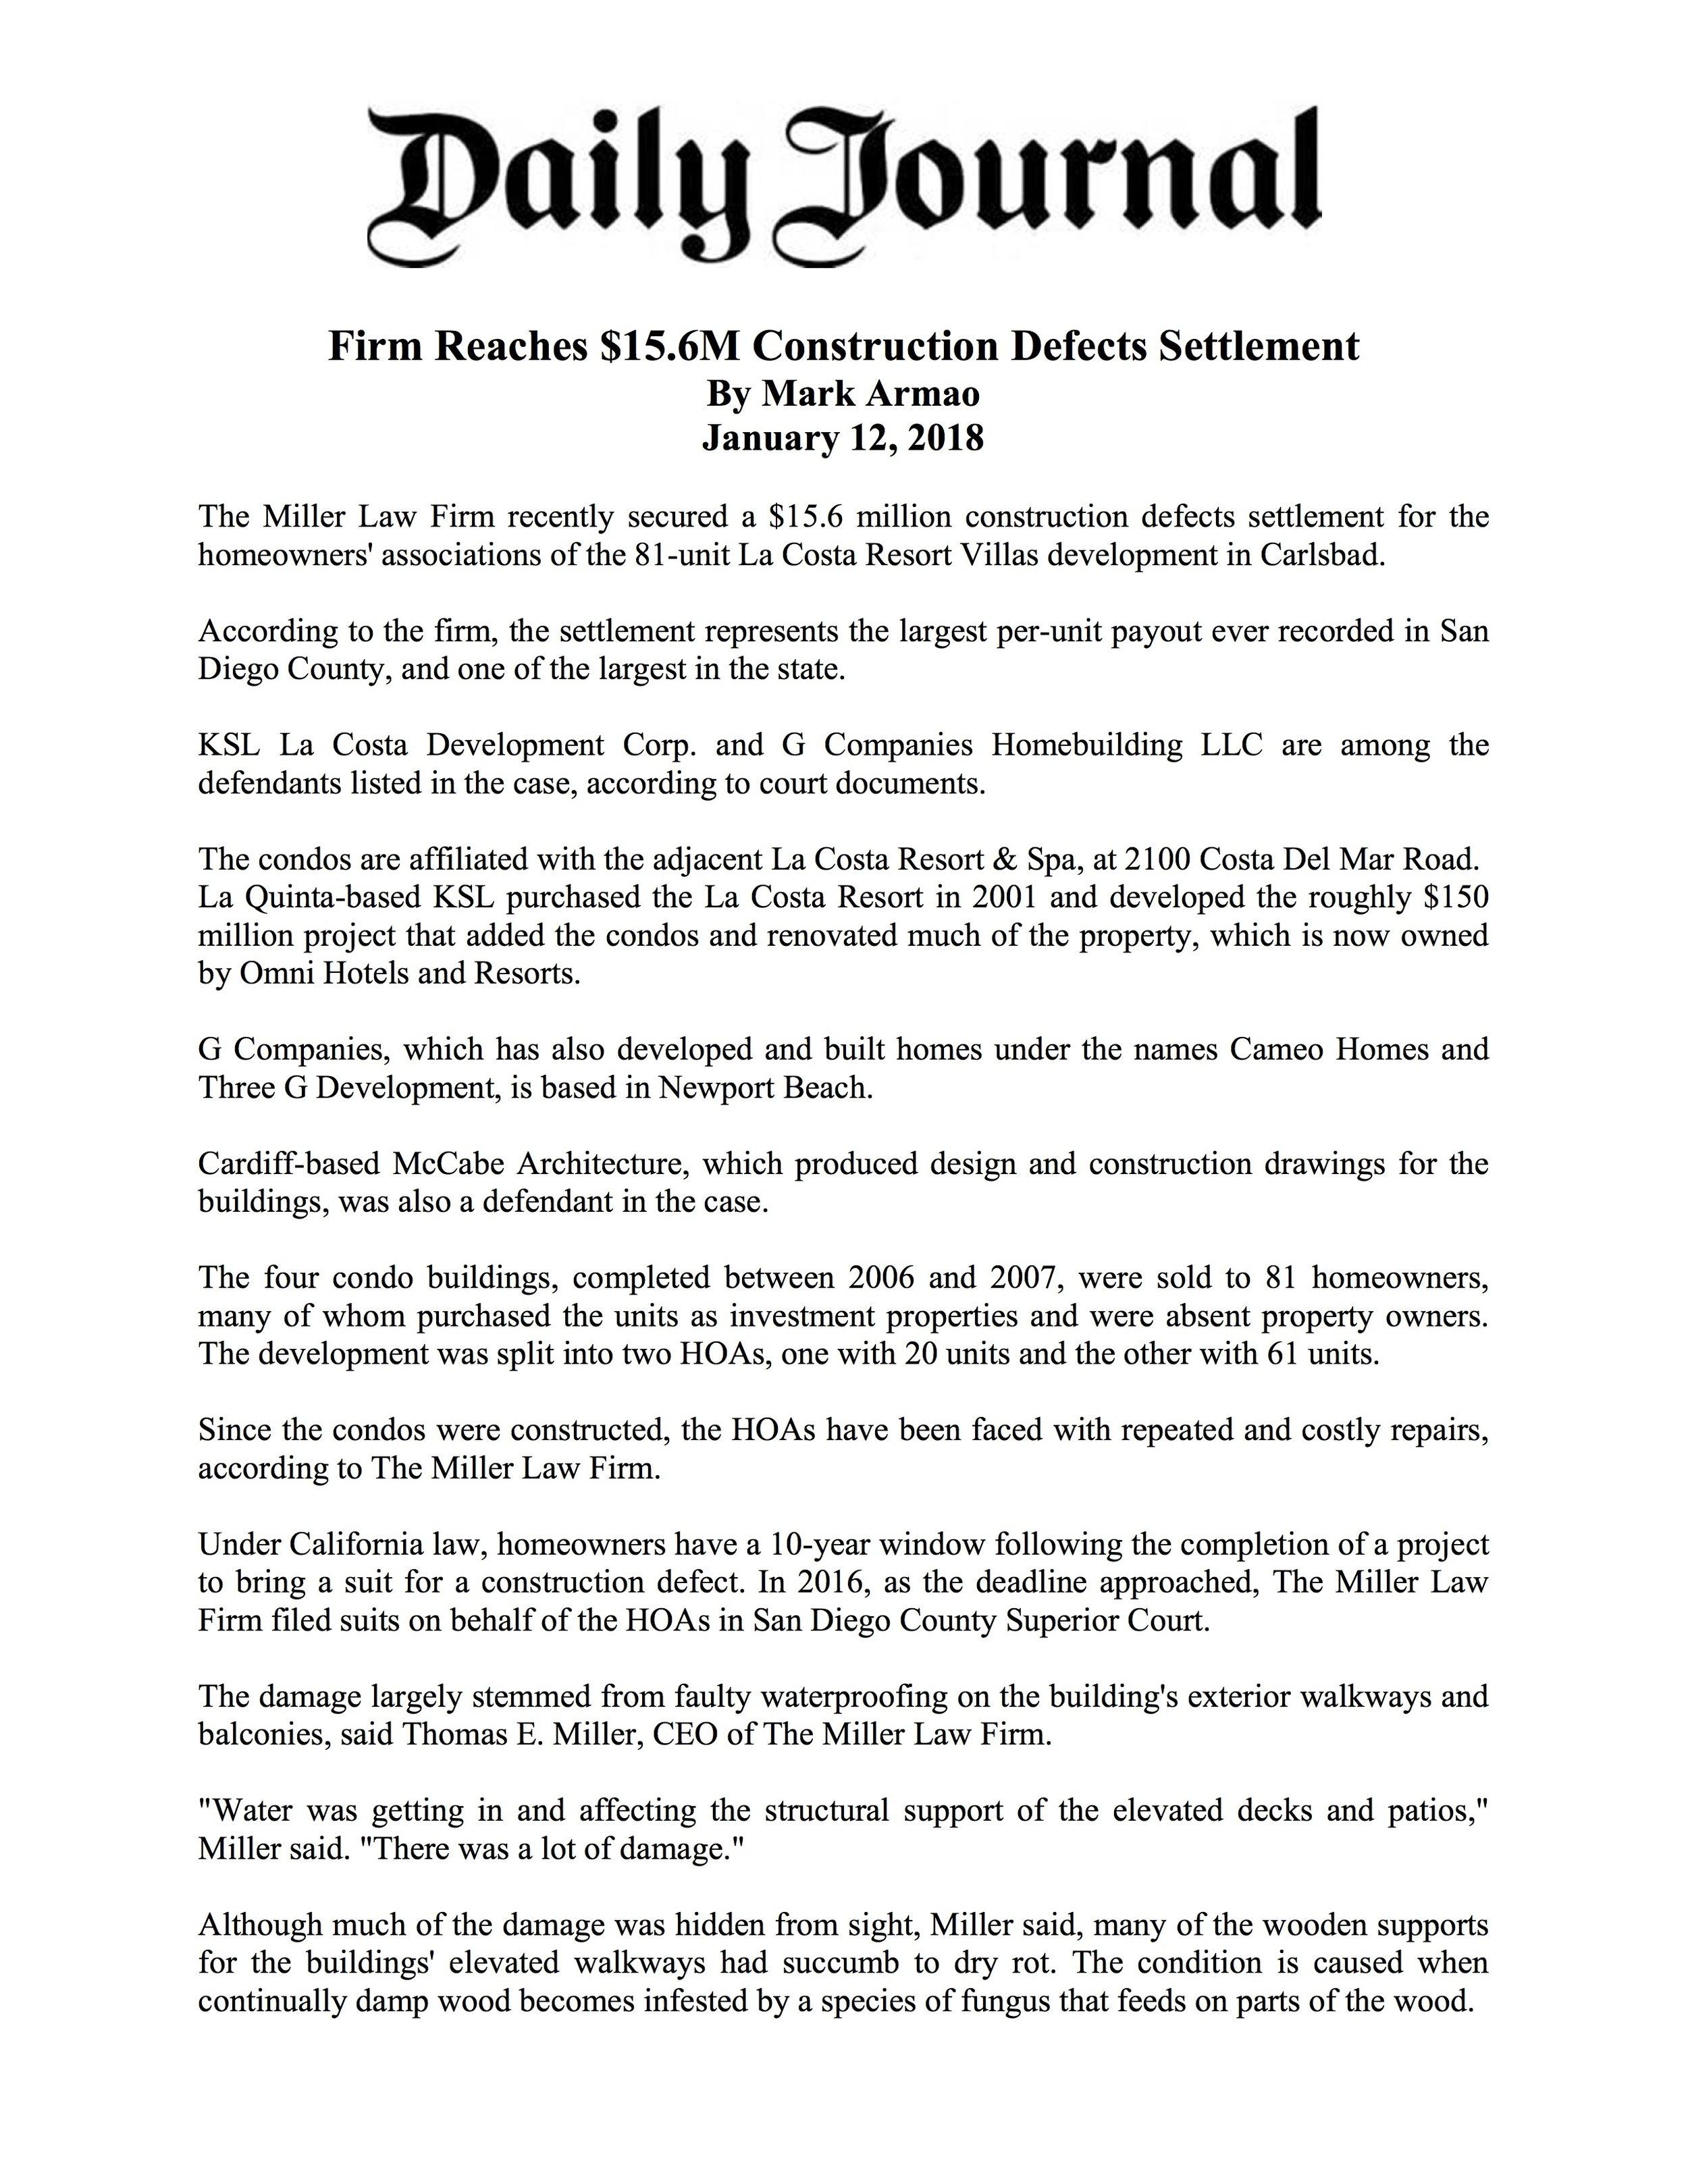 Daily Journal -Firm Reaches $15.6M Construction Defects Settlement